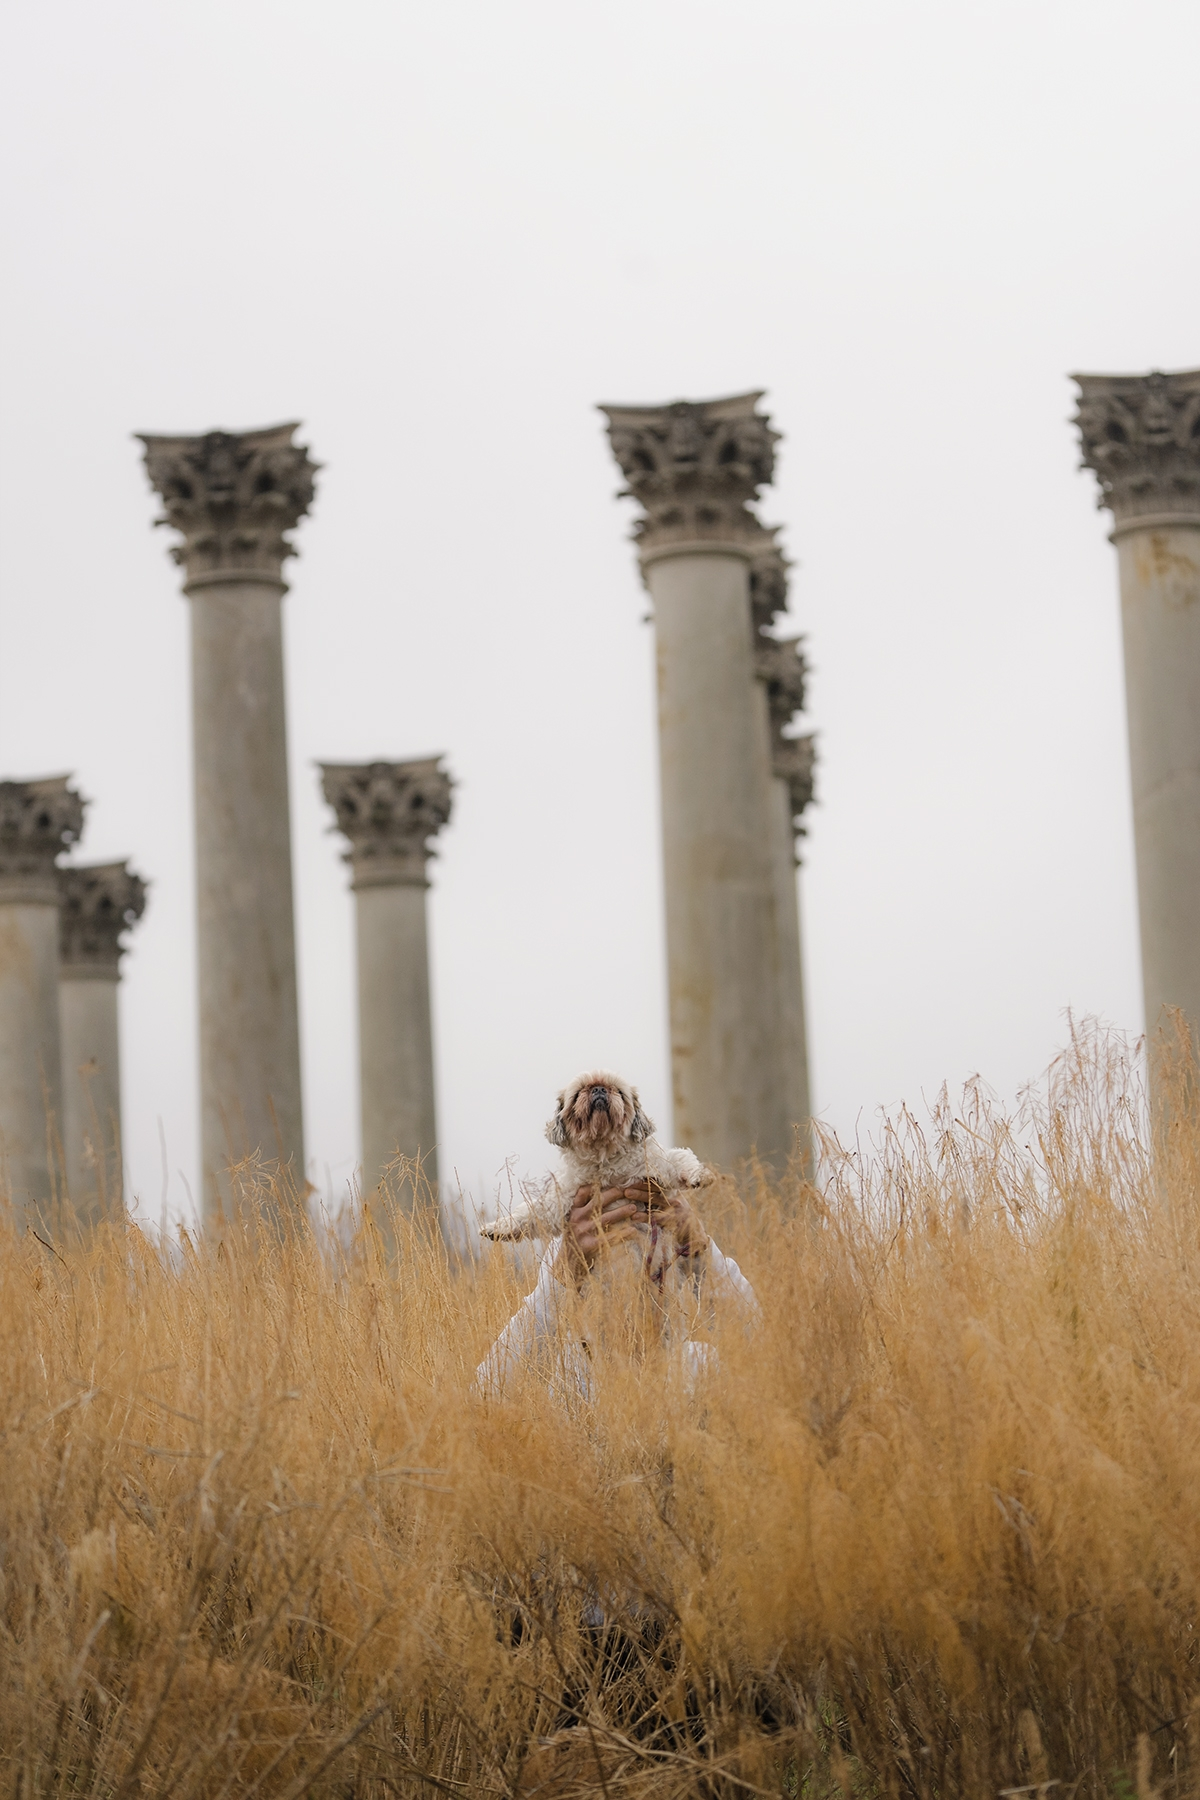 United States National Arboretum, northeast dc, washington dc, Capitol Columns, botanical gardens, fall, autumn, corinthian columns, anacostia river, new york avenue,